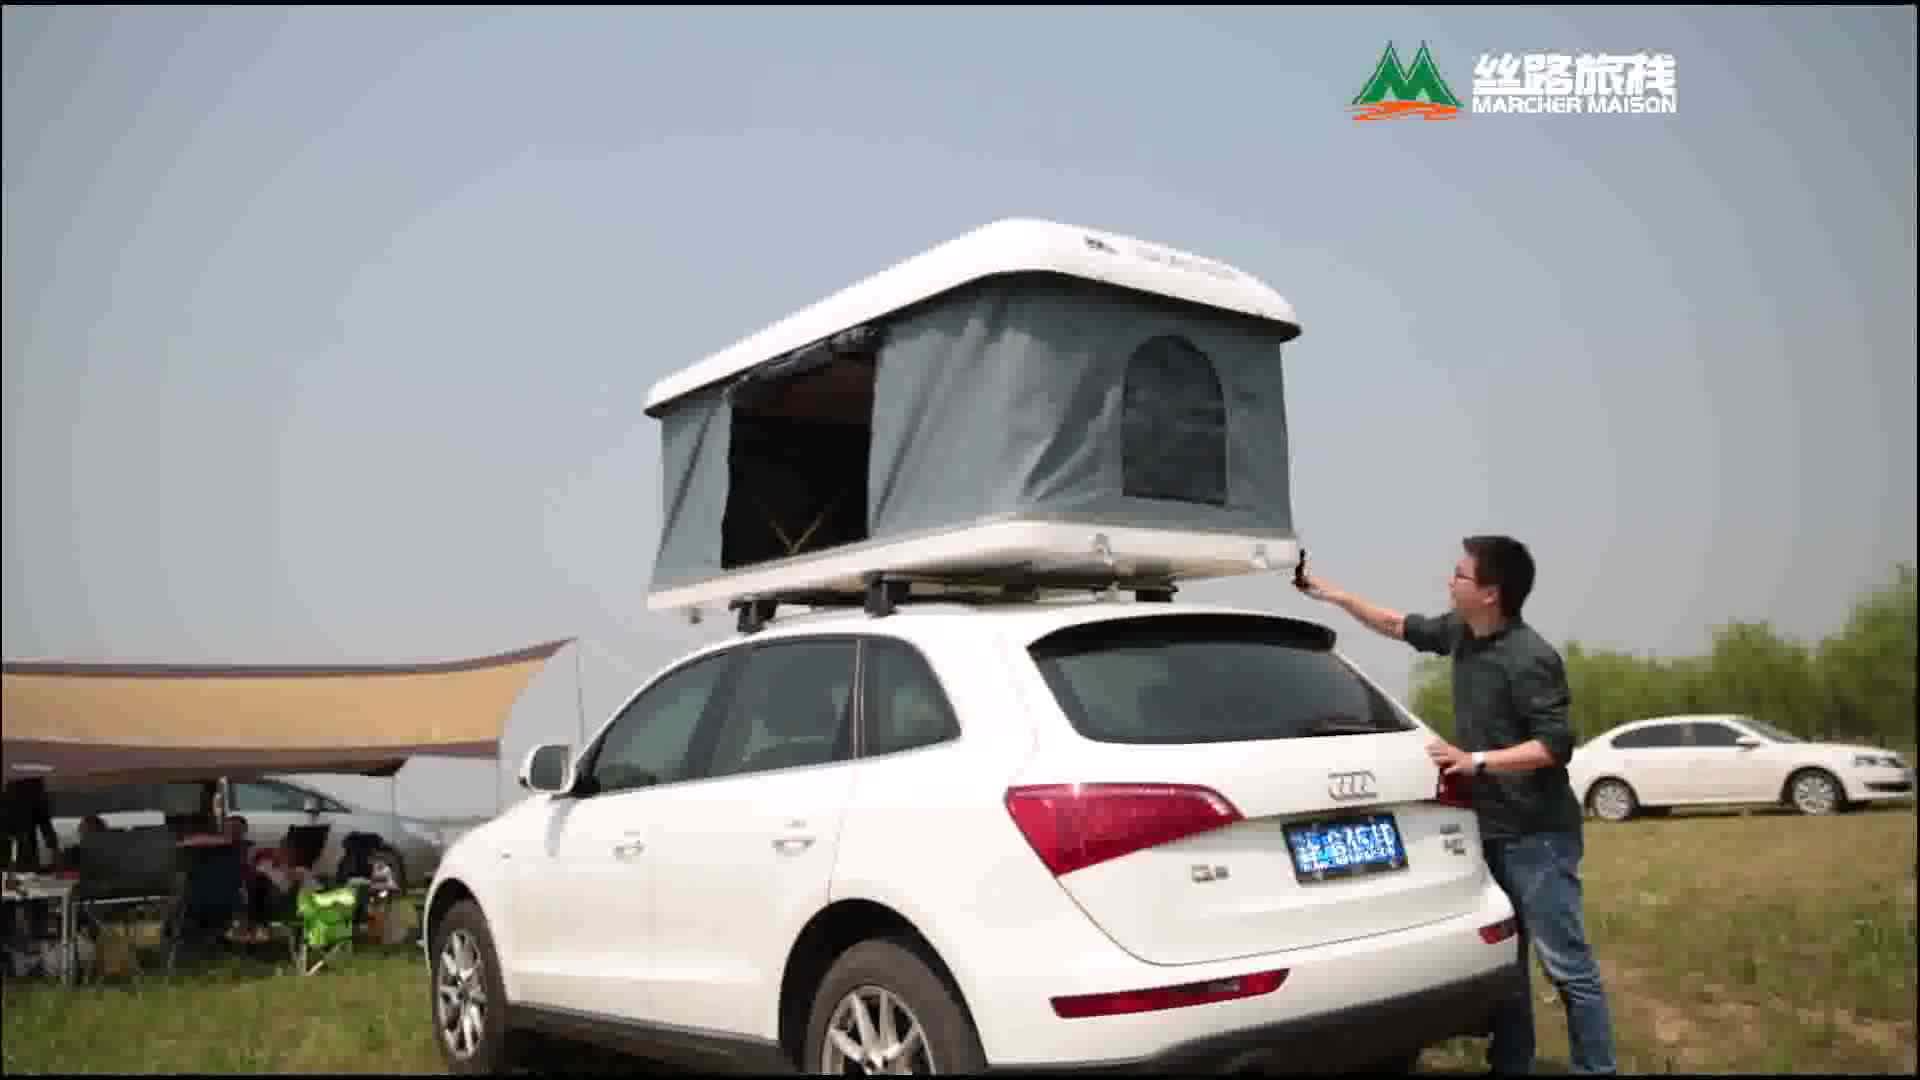 2019 MARCHER MAISON 지붕 텐트 Hard 쉘 차 Roof Top 카 텐트 천막